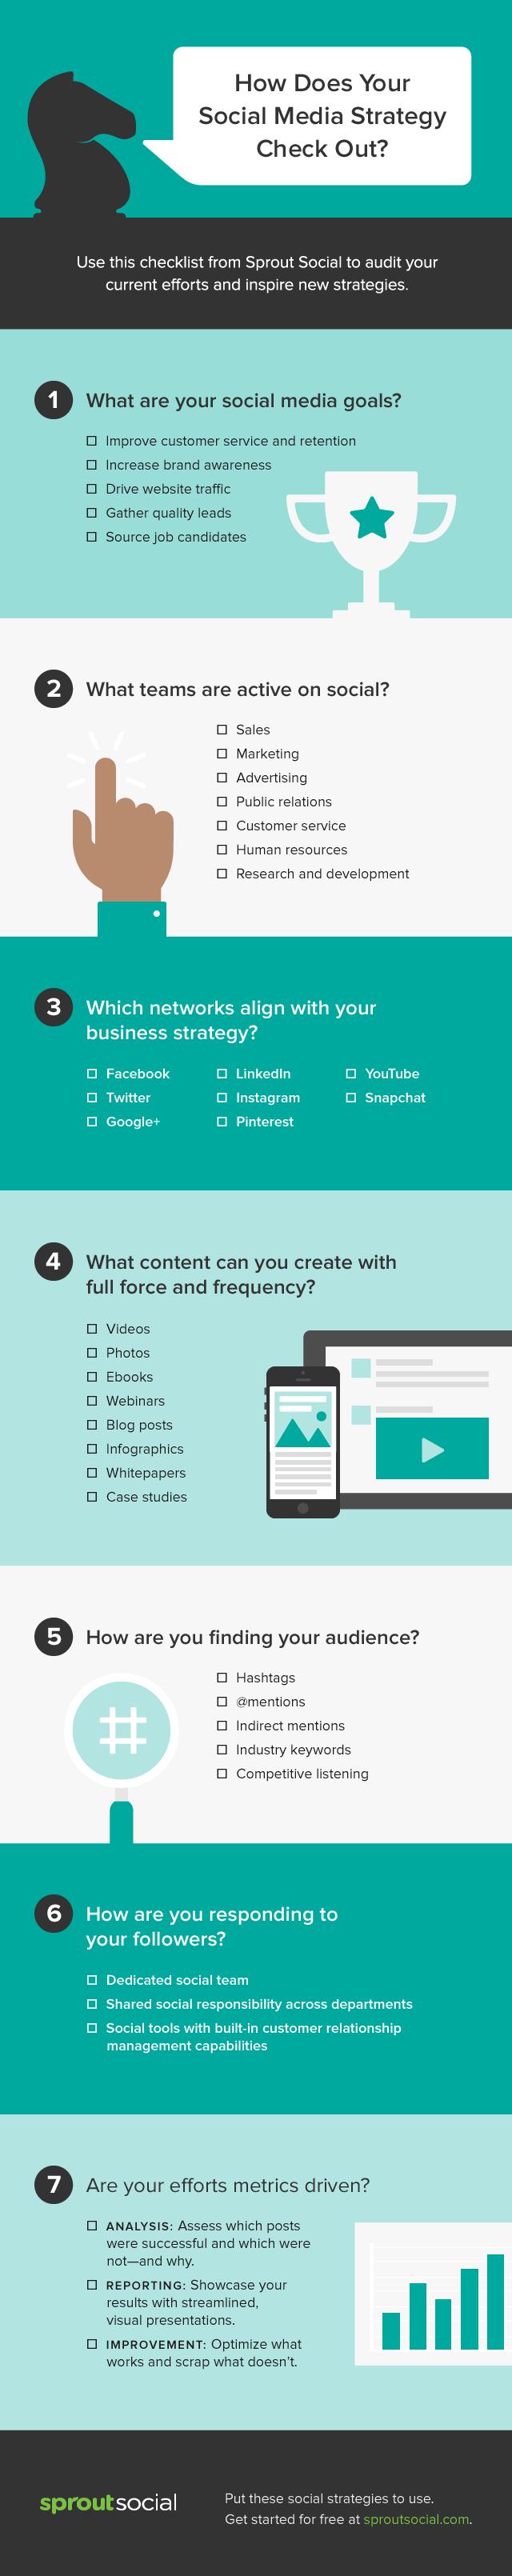 the-social-media-marketing-checklist_54f7586463dbc